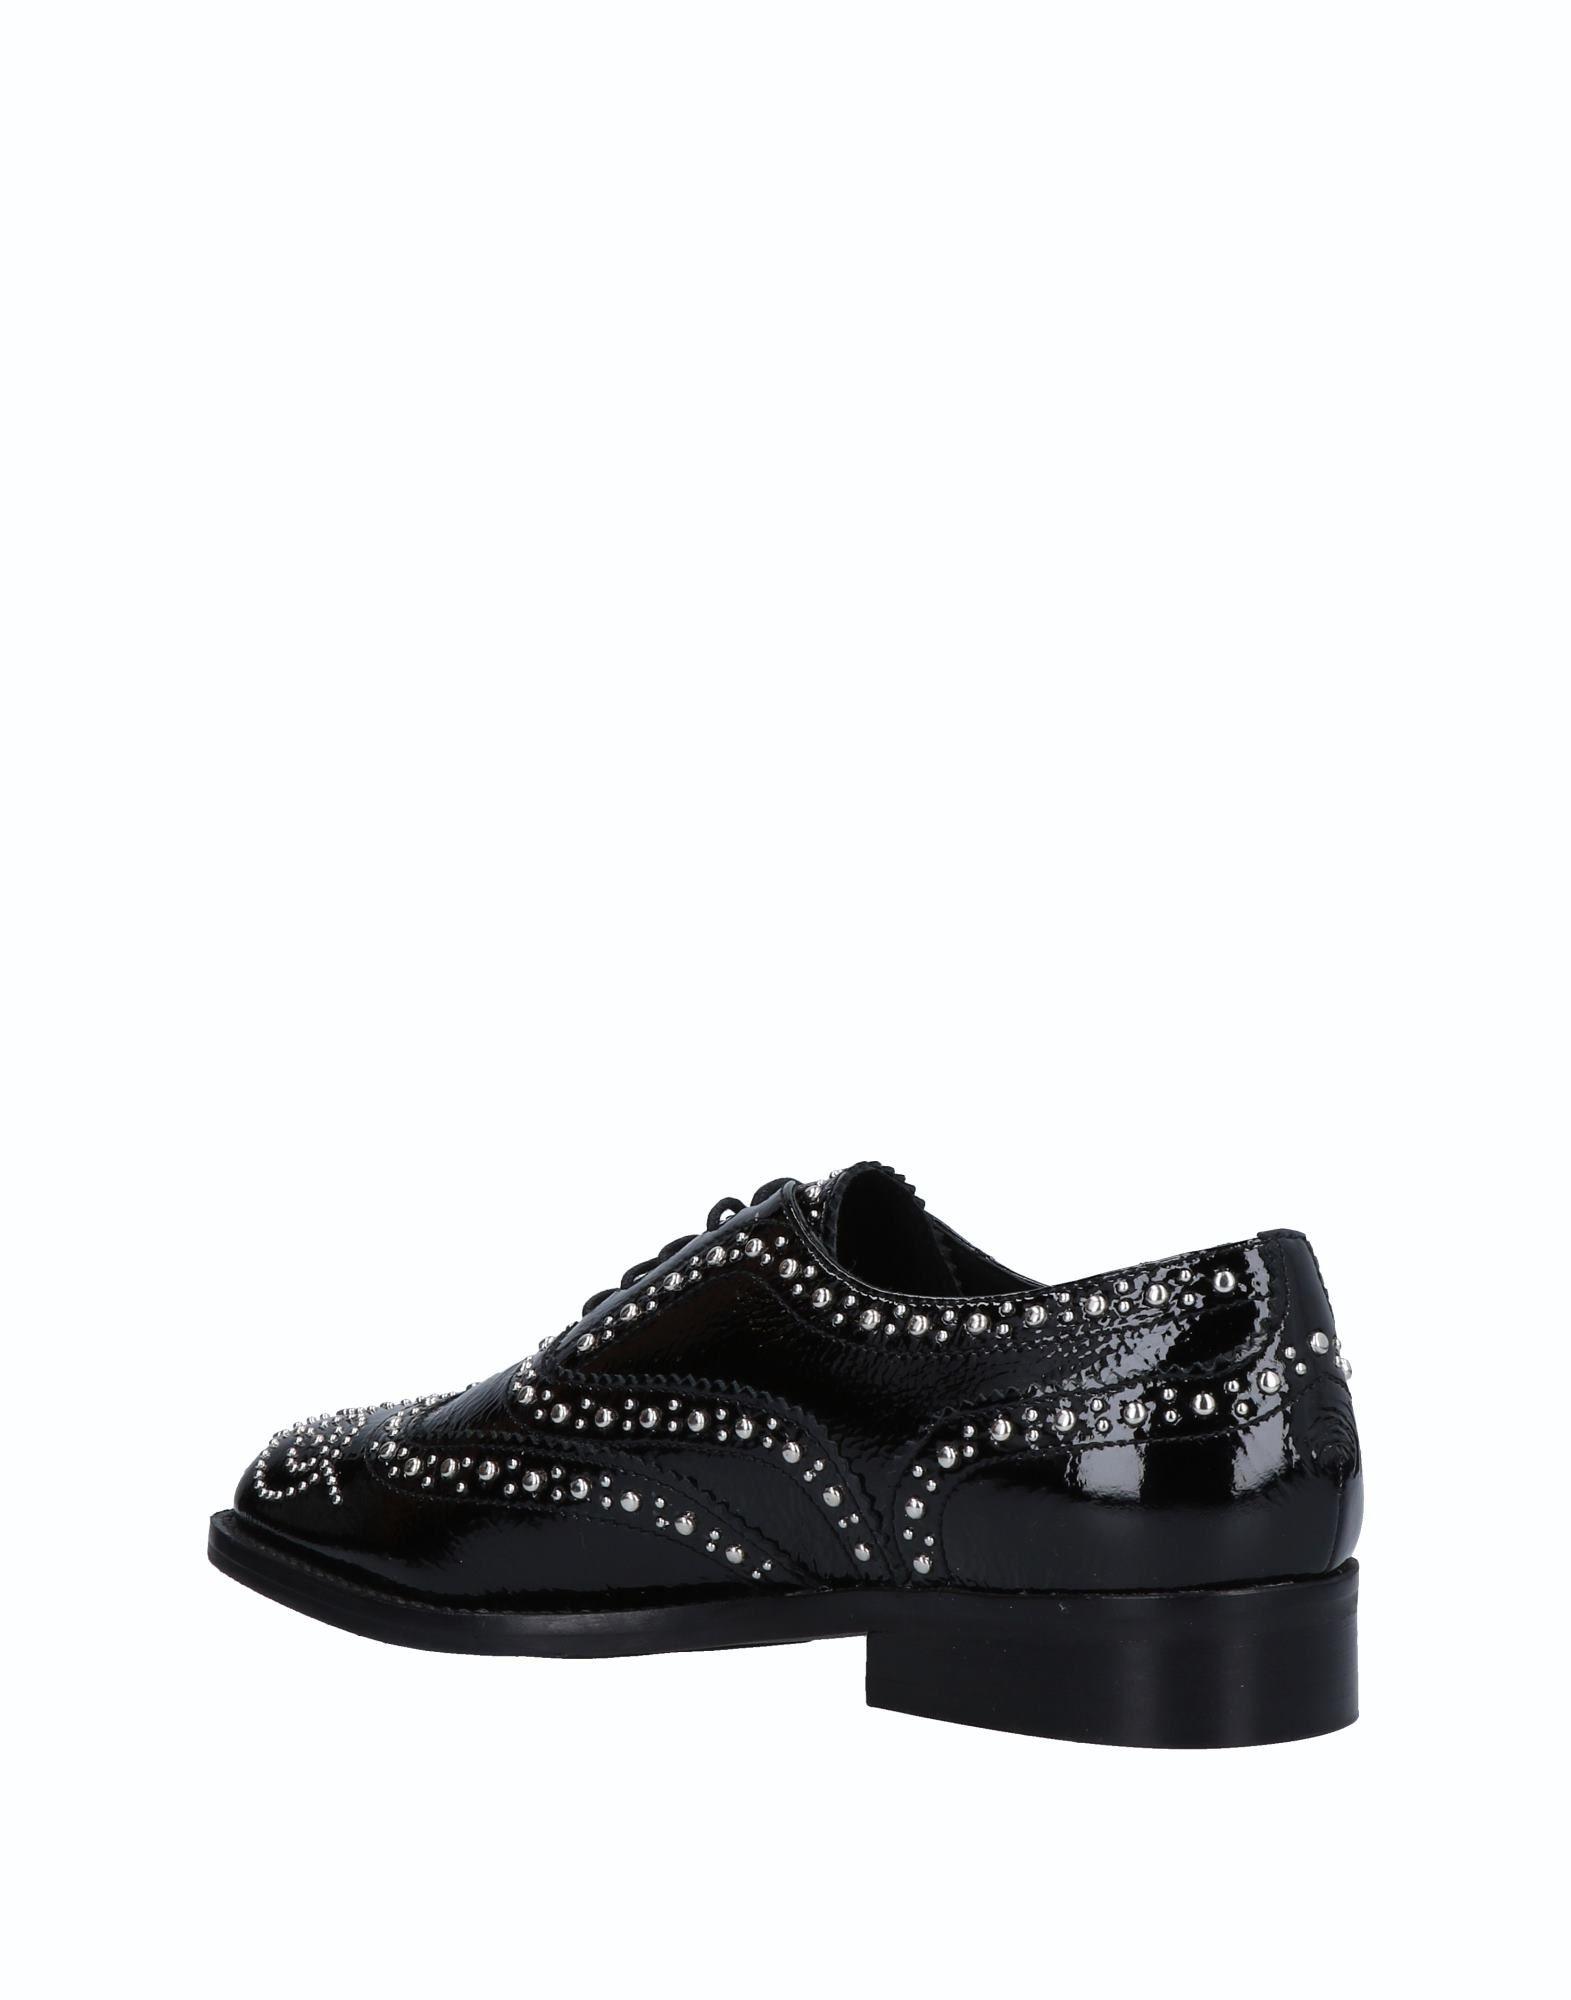 Bprivate Schnürschuhe Qualität Damen  11512699TC Gute Qualität Schnürschuhe beliebte Schuhe 1905b8